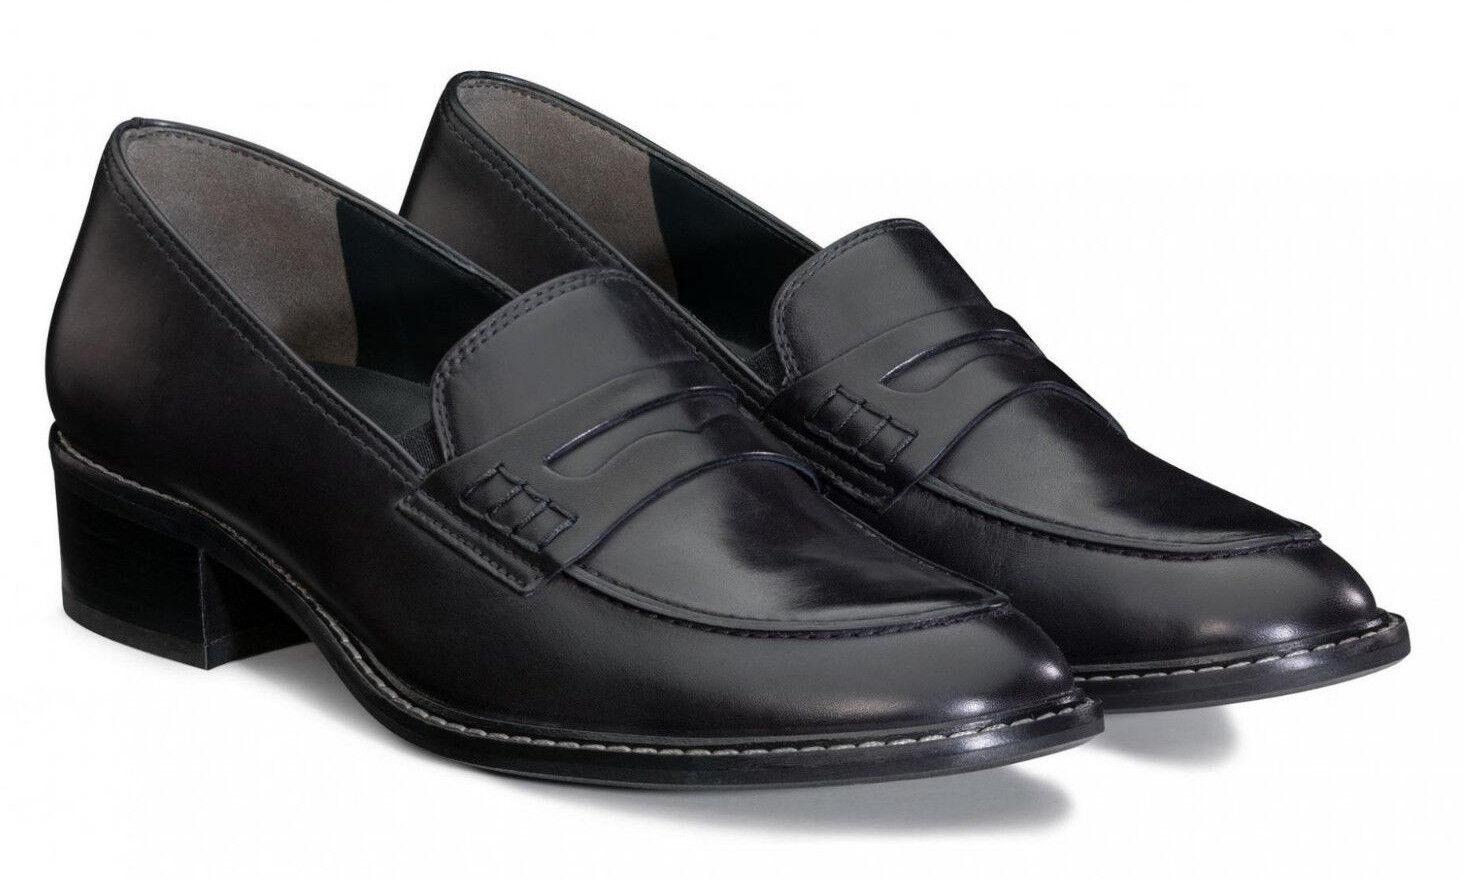 NEU Schuhe Paul Grün 2148 051 Schuhe NEU Slipper Trotteur Loafer ocean blau Leder 189dc1